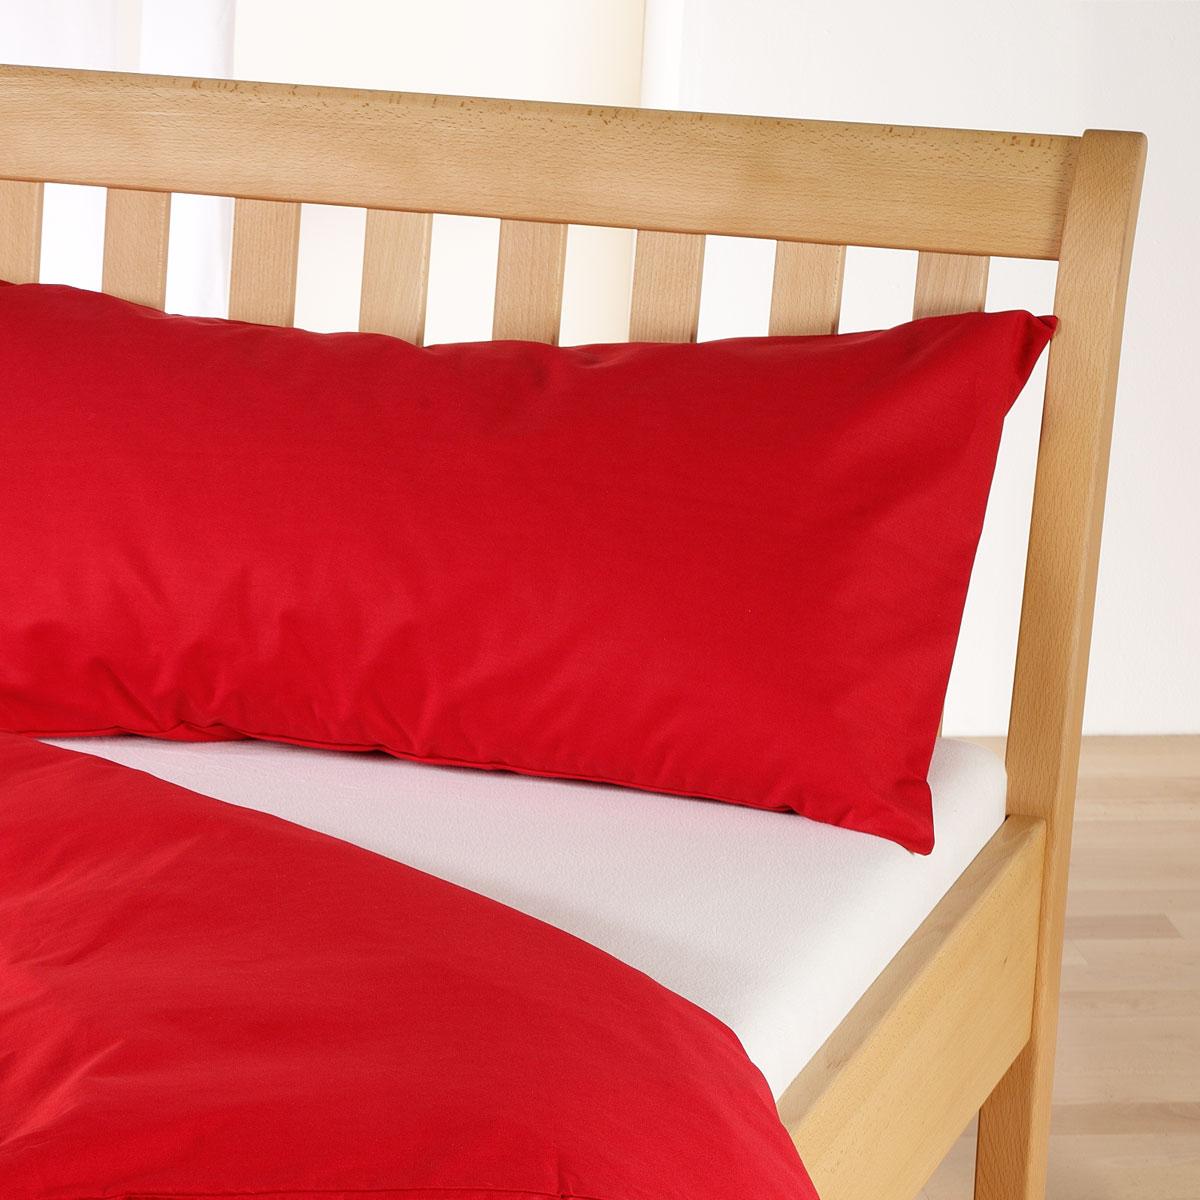 cotonea edel linonbettw sche uni rot g nstig online kaufen bei bettwaren shop. Black Bedroom Furniture Sets. Home Design Ideas